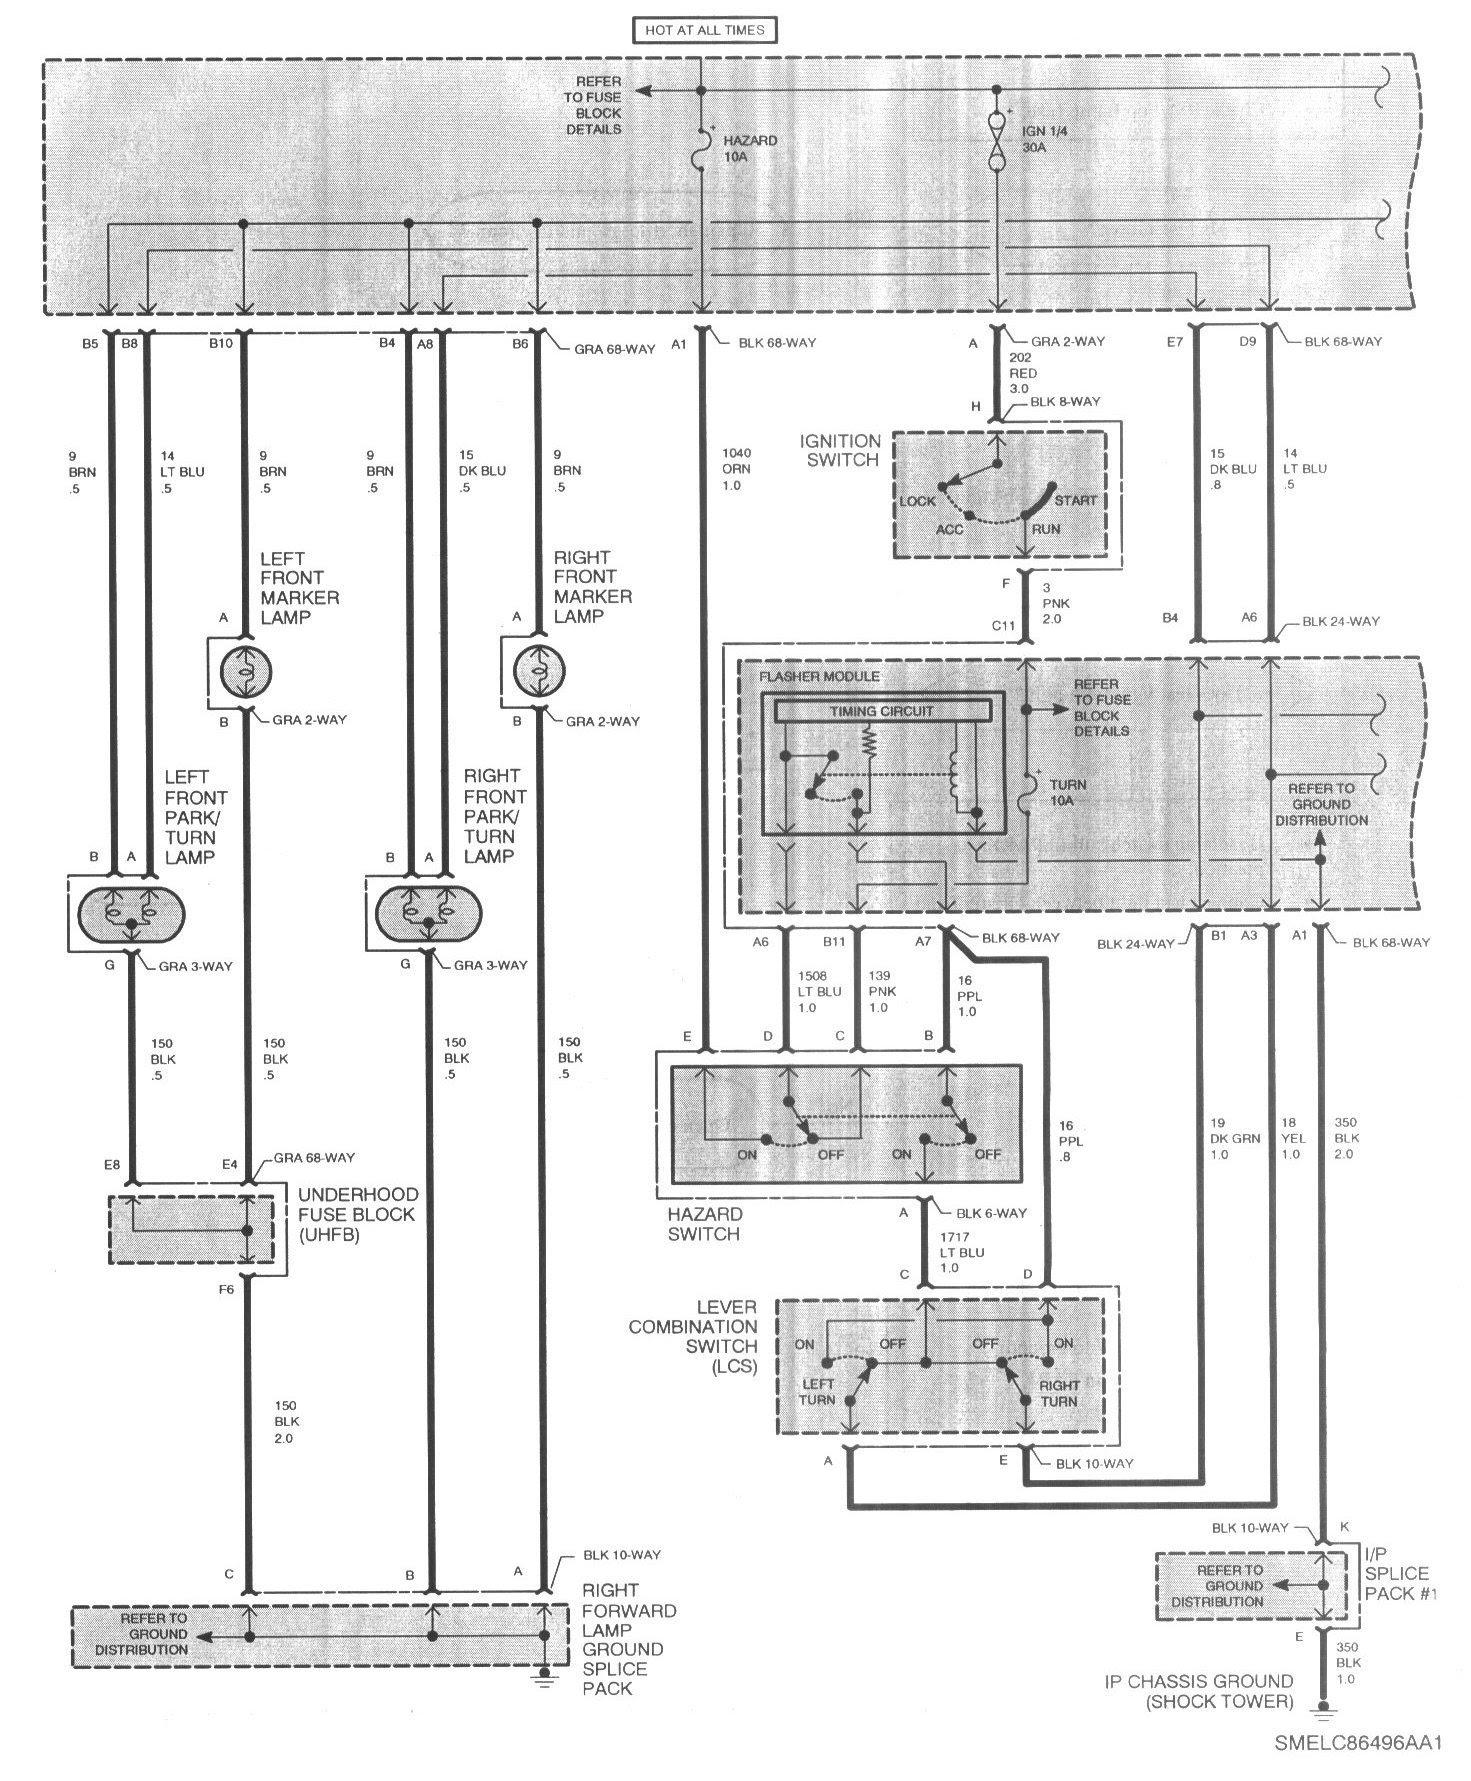 2002 Saturn Vue Wiring Diagram Schematic Wiring Diagram Fix Fix Lechicchedimammavale It